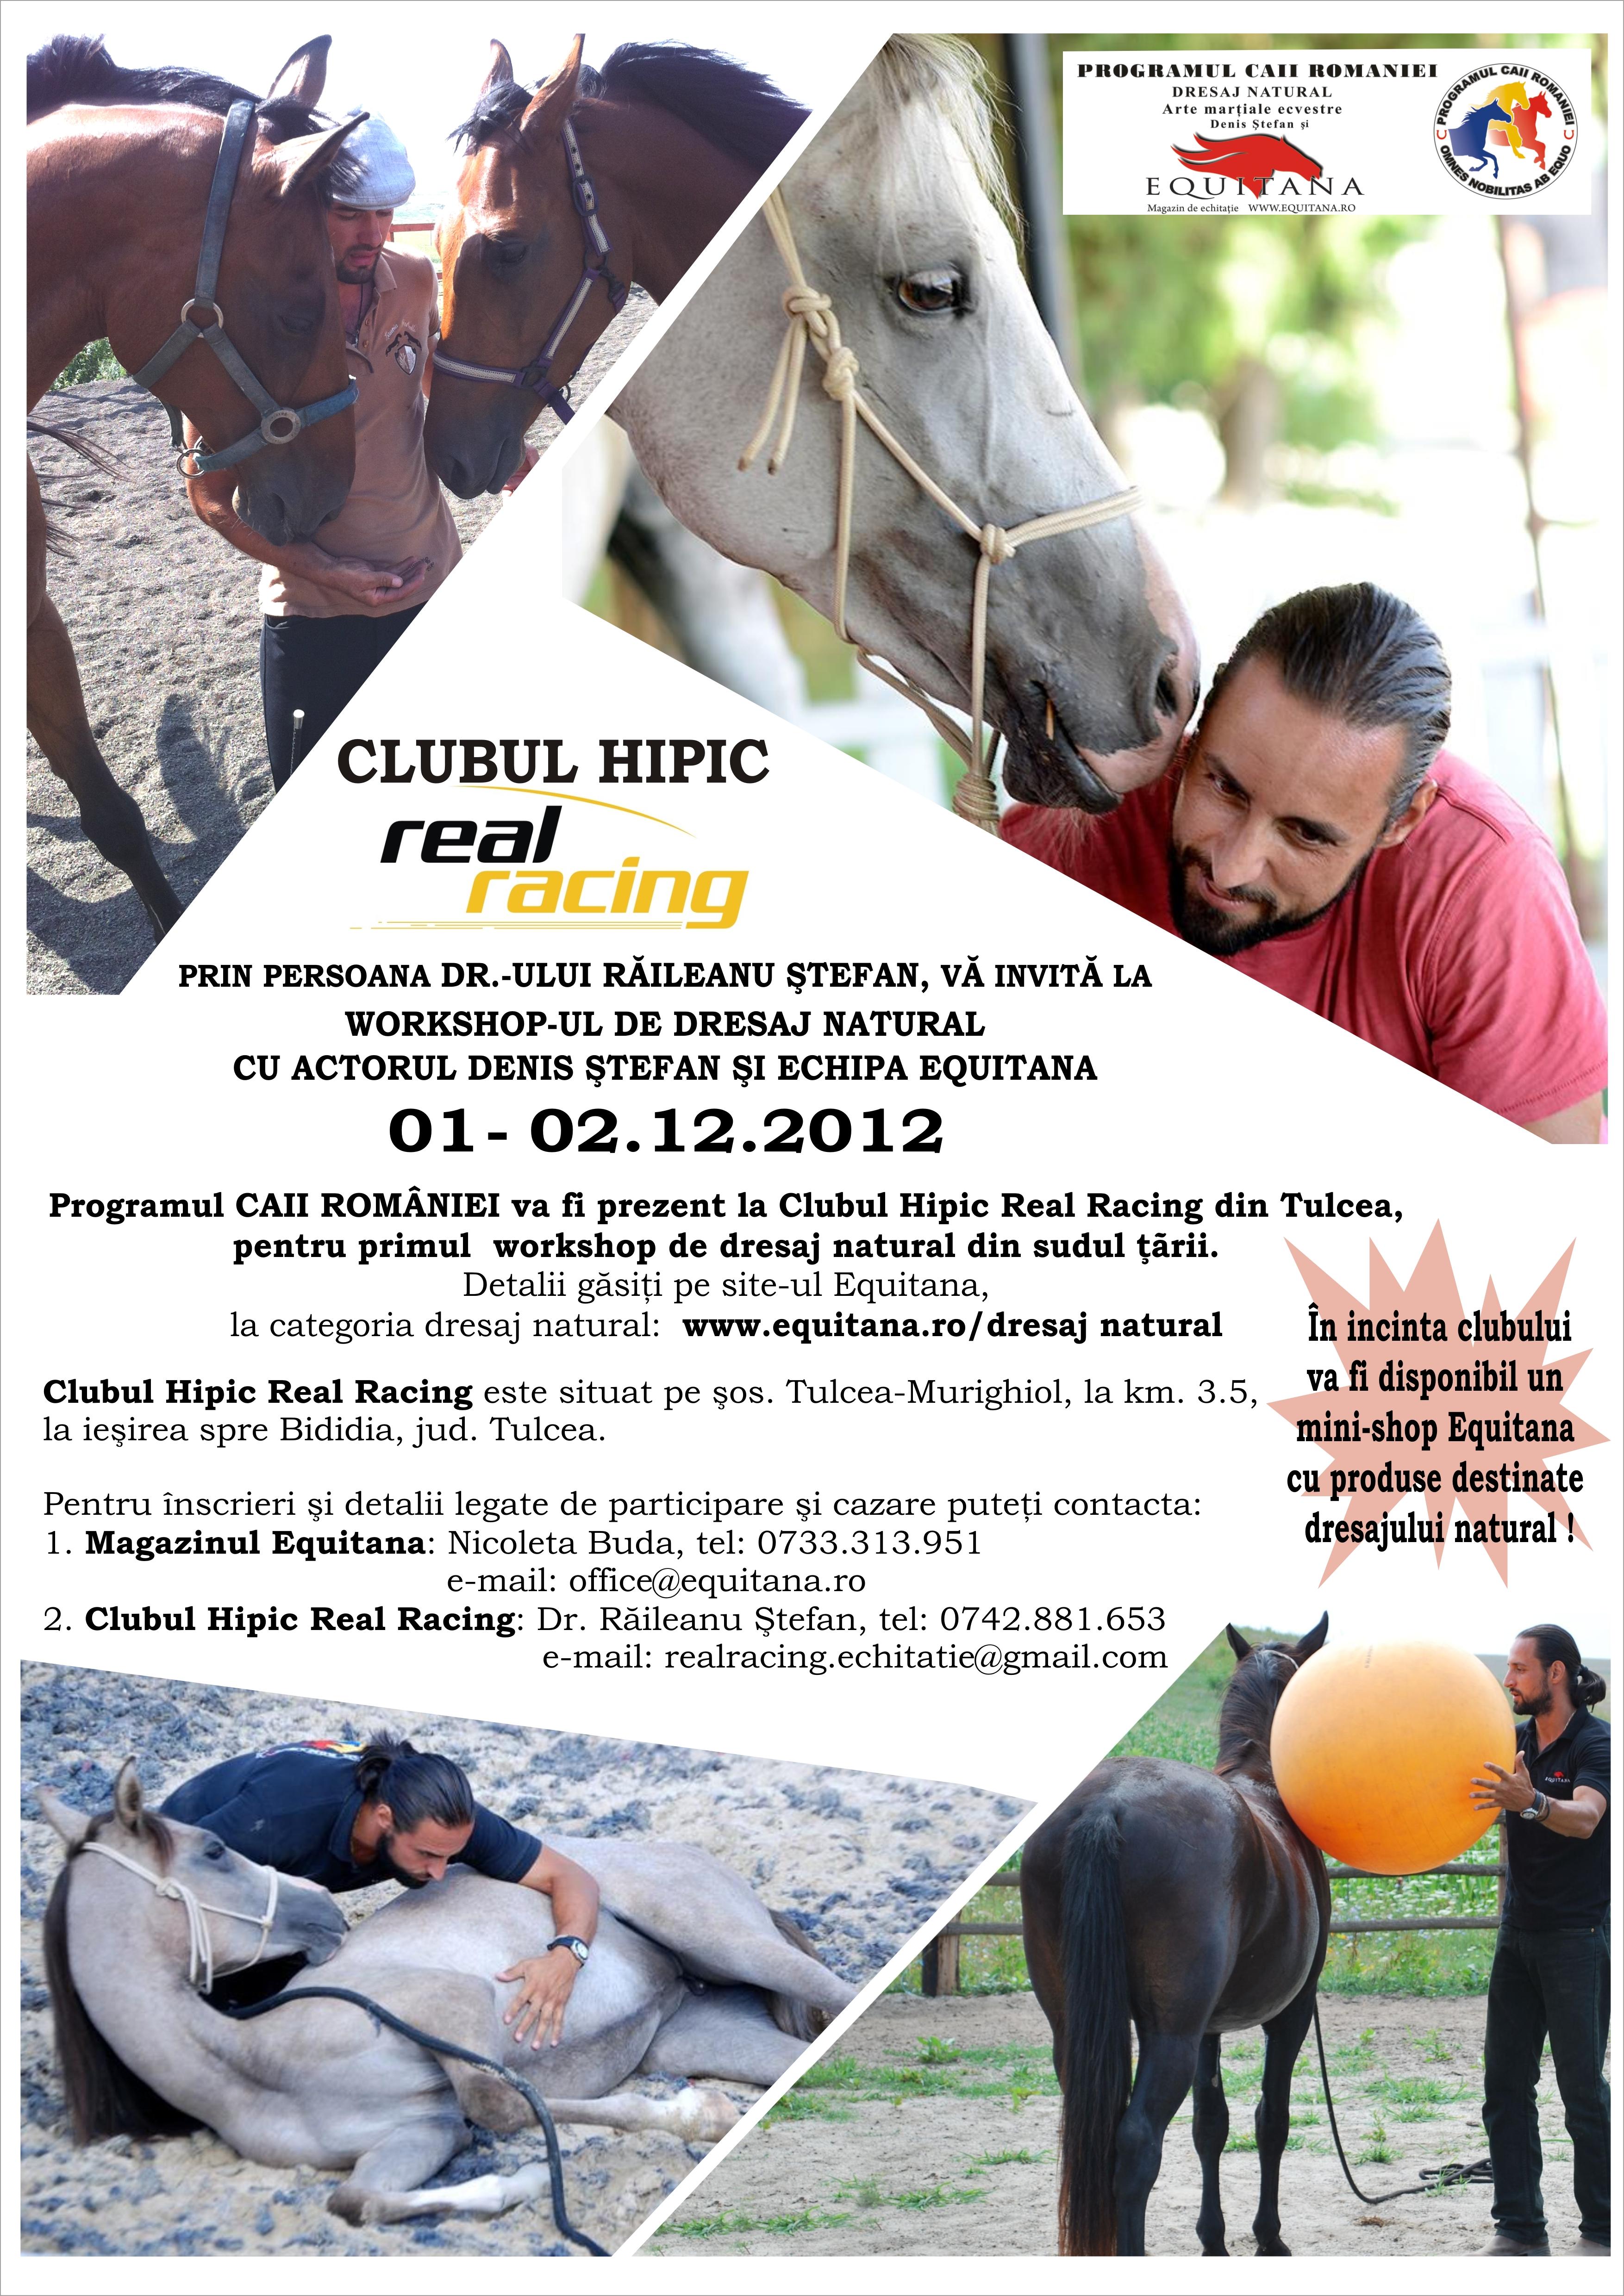 WORKSHOP DE DRESAJ NATURAL LA REAL RACING TULCEA, 01-02.12.2012